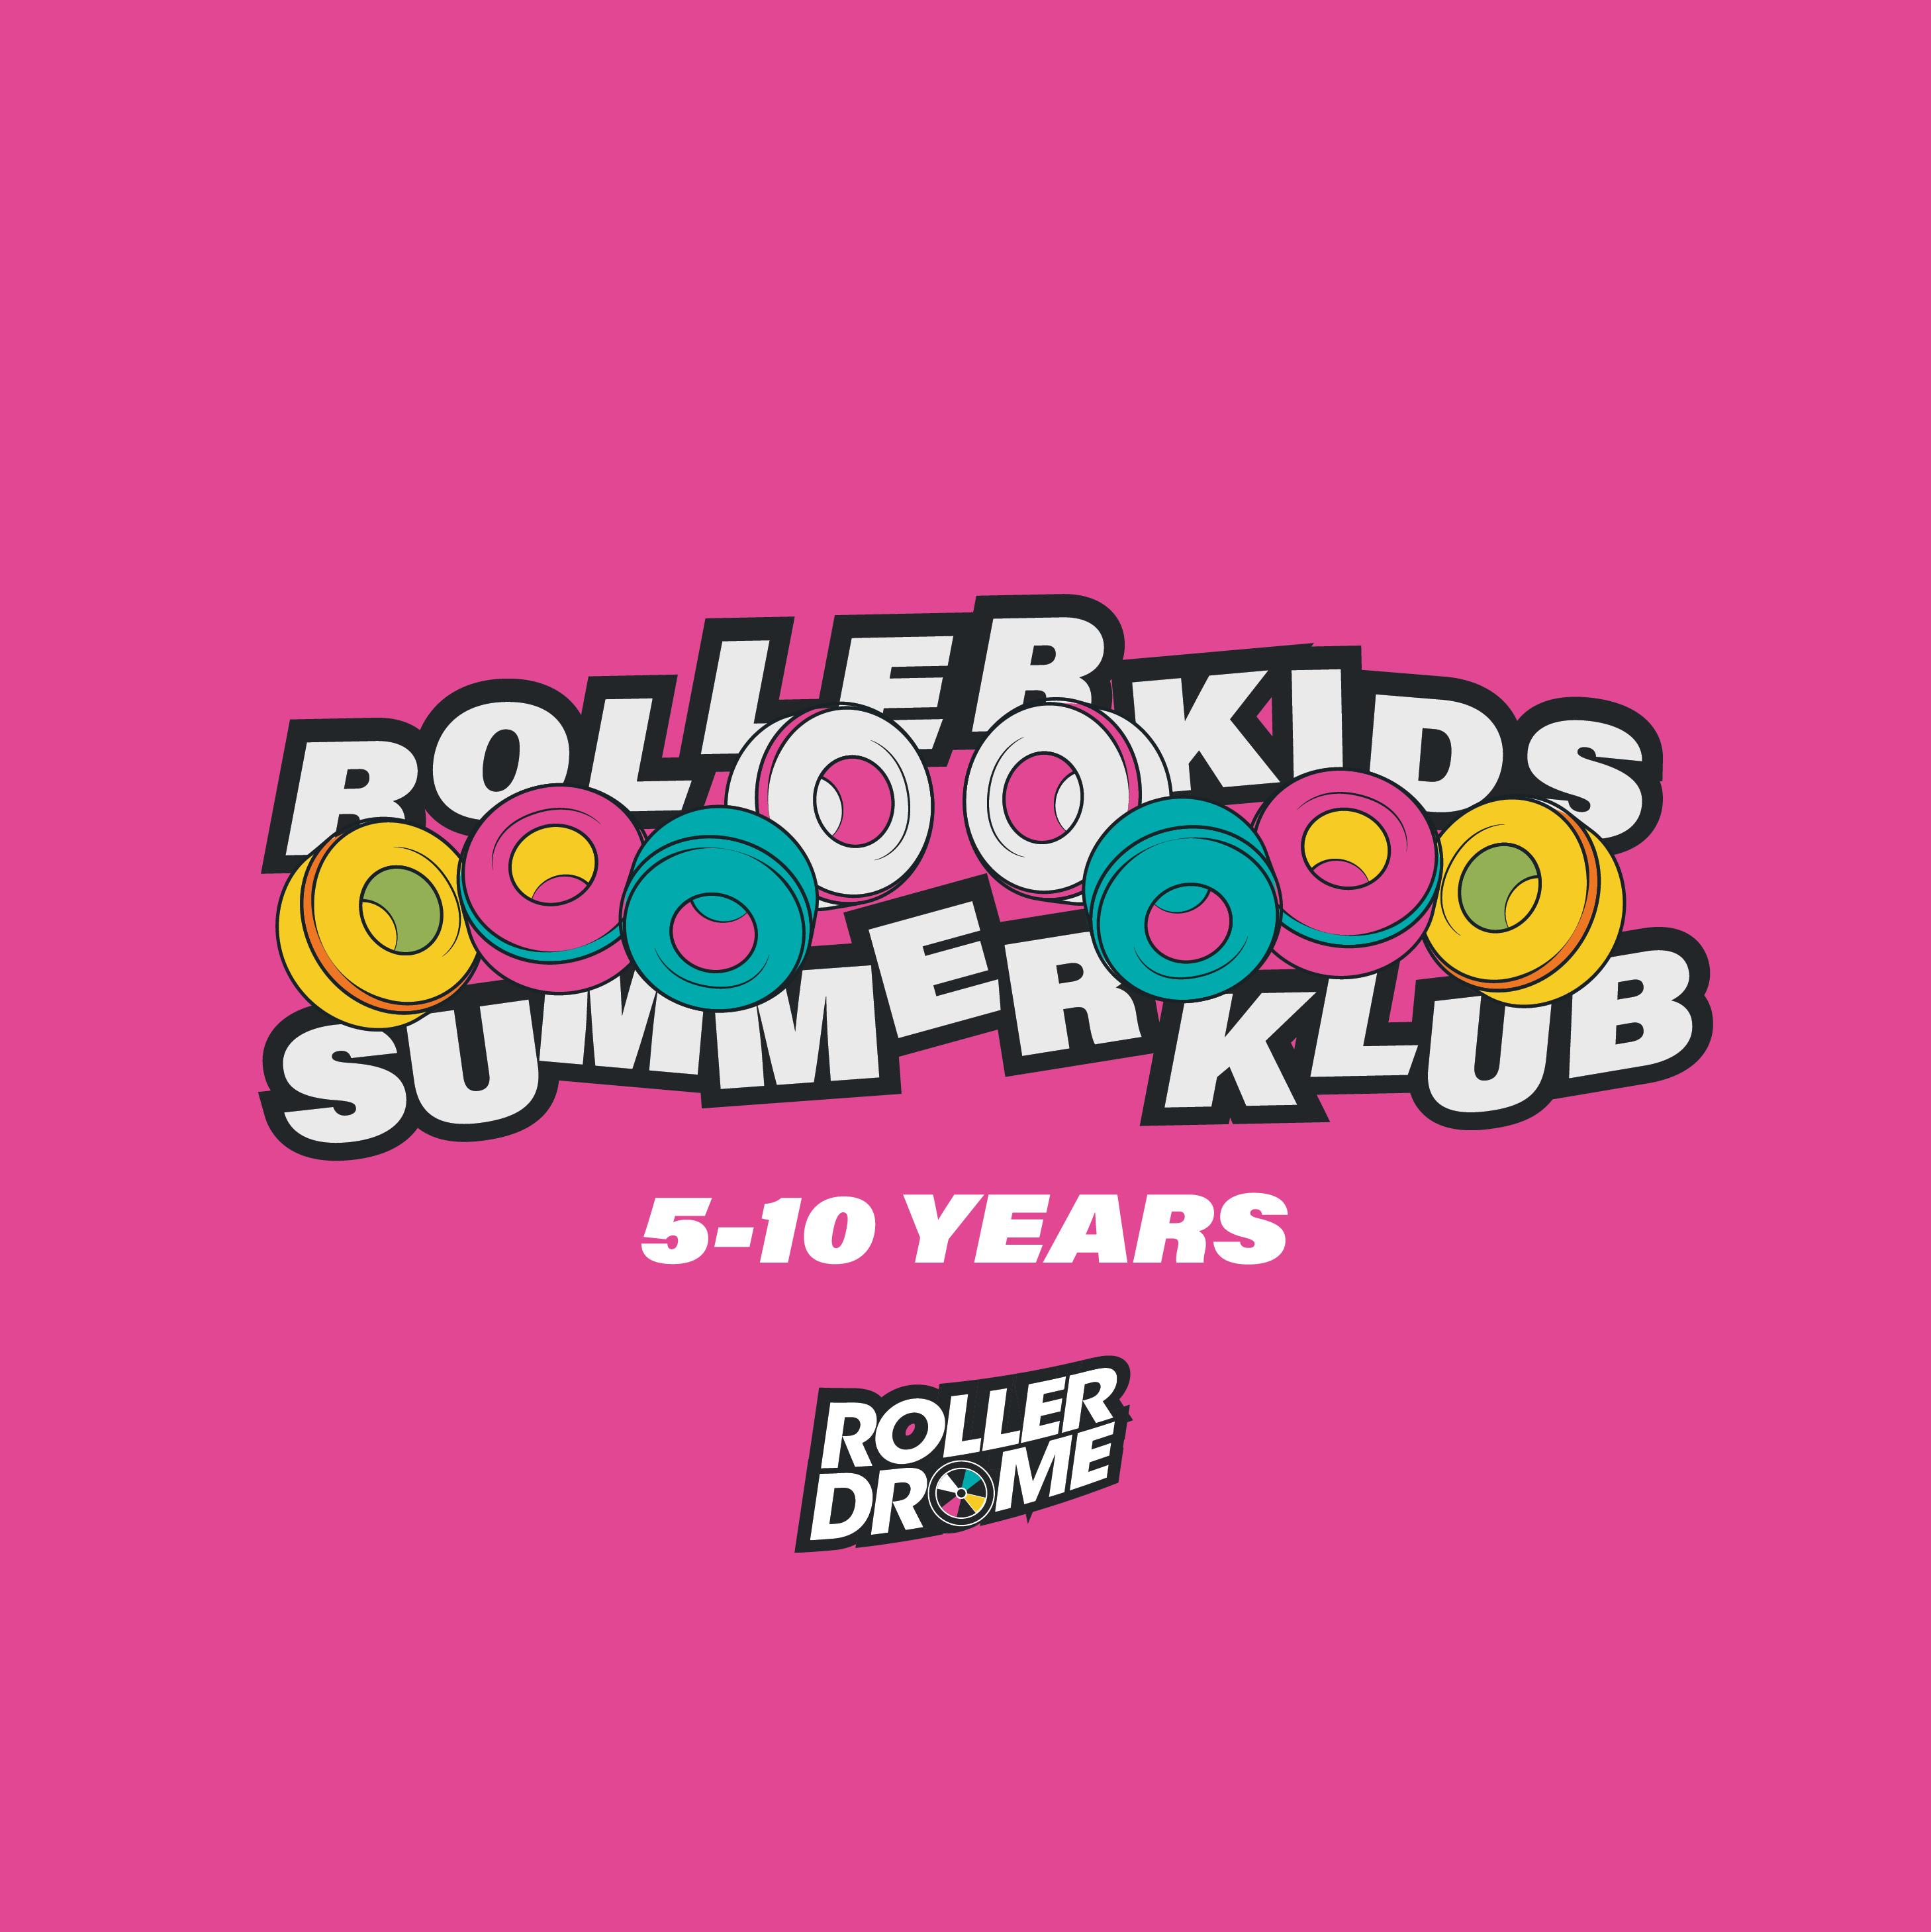 Rollerkids Summer Klub 5-10 years